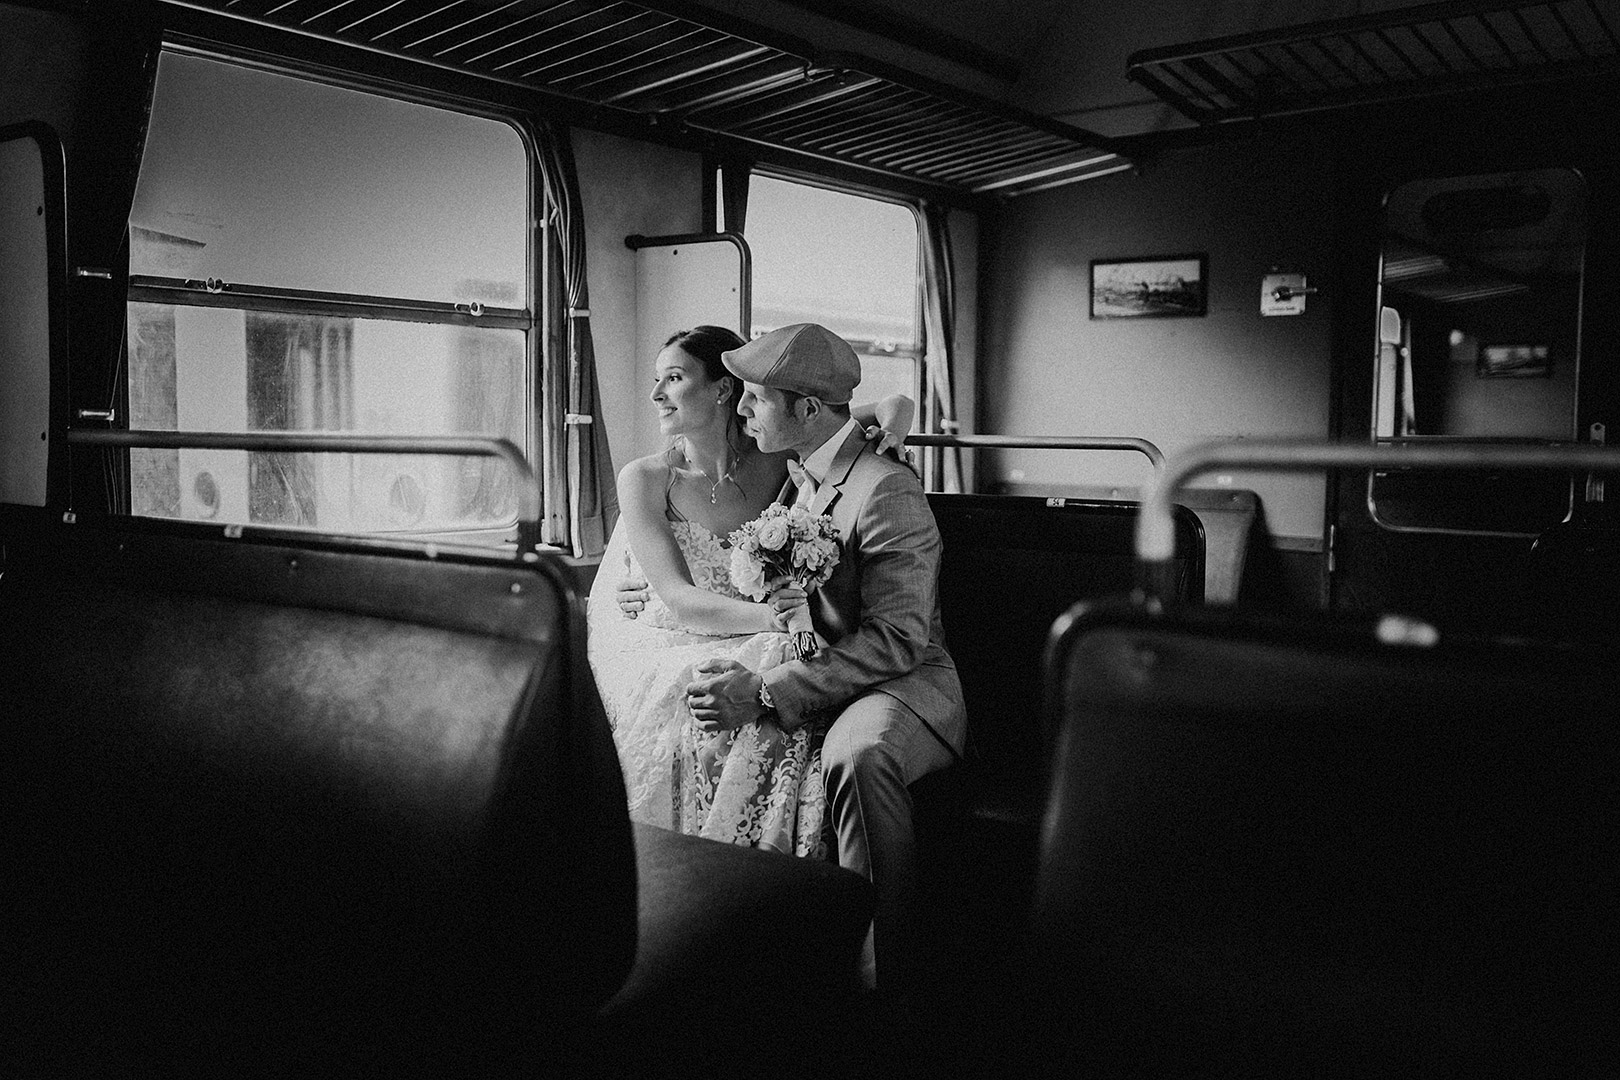 portrait_wedding_annkathrinundandreas_74